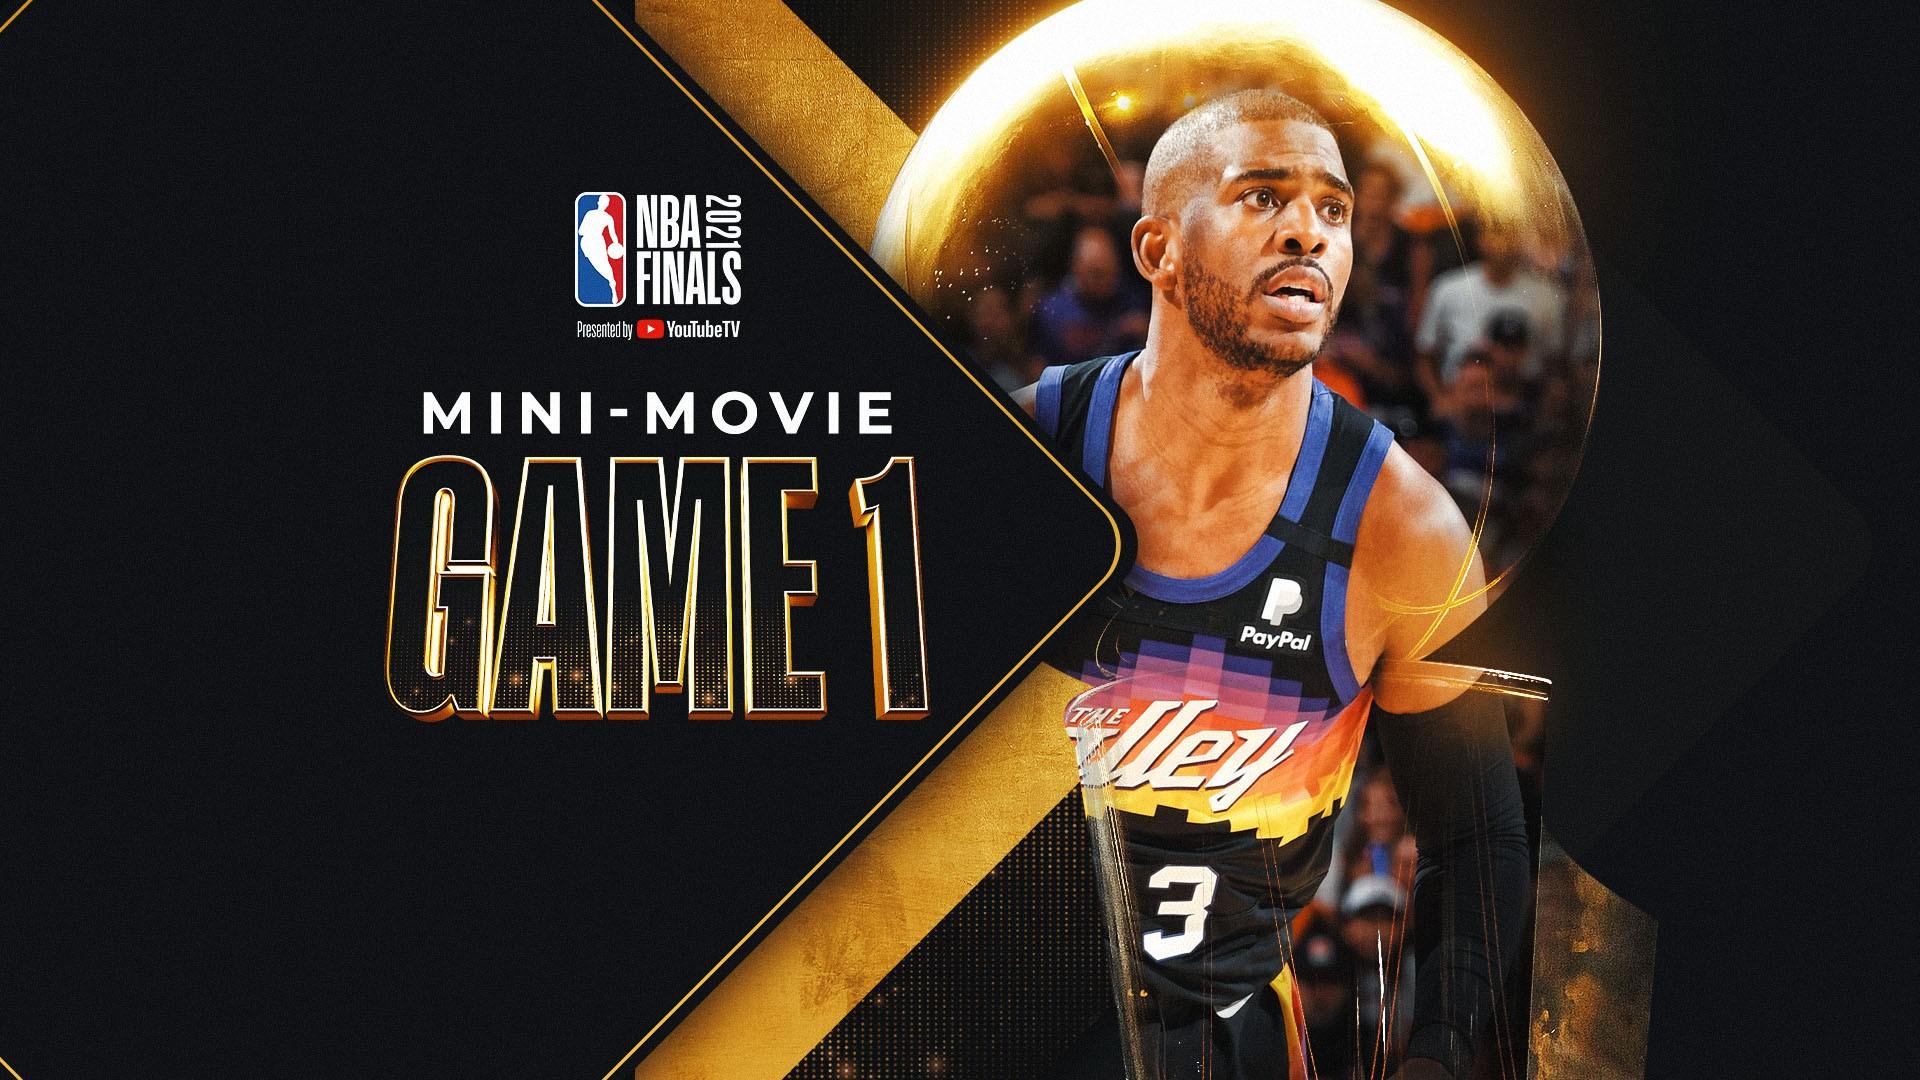 2021 NBA Finals Mini-Movie: Game 1